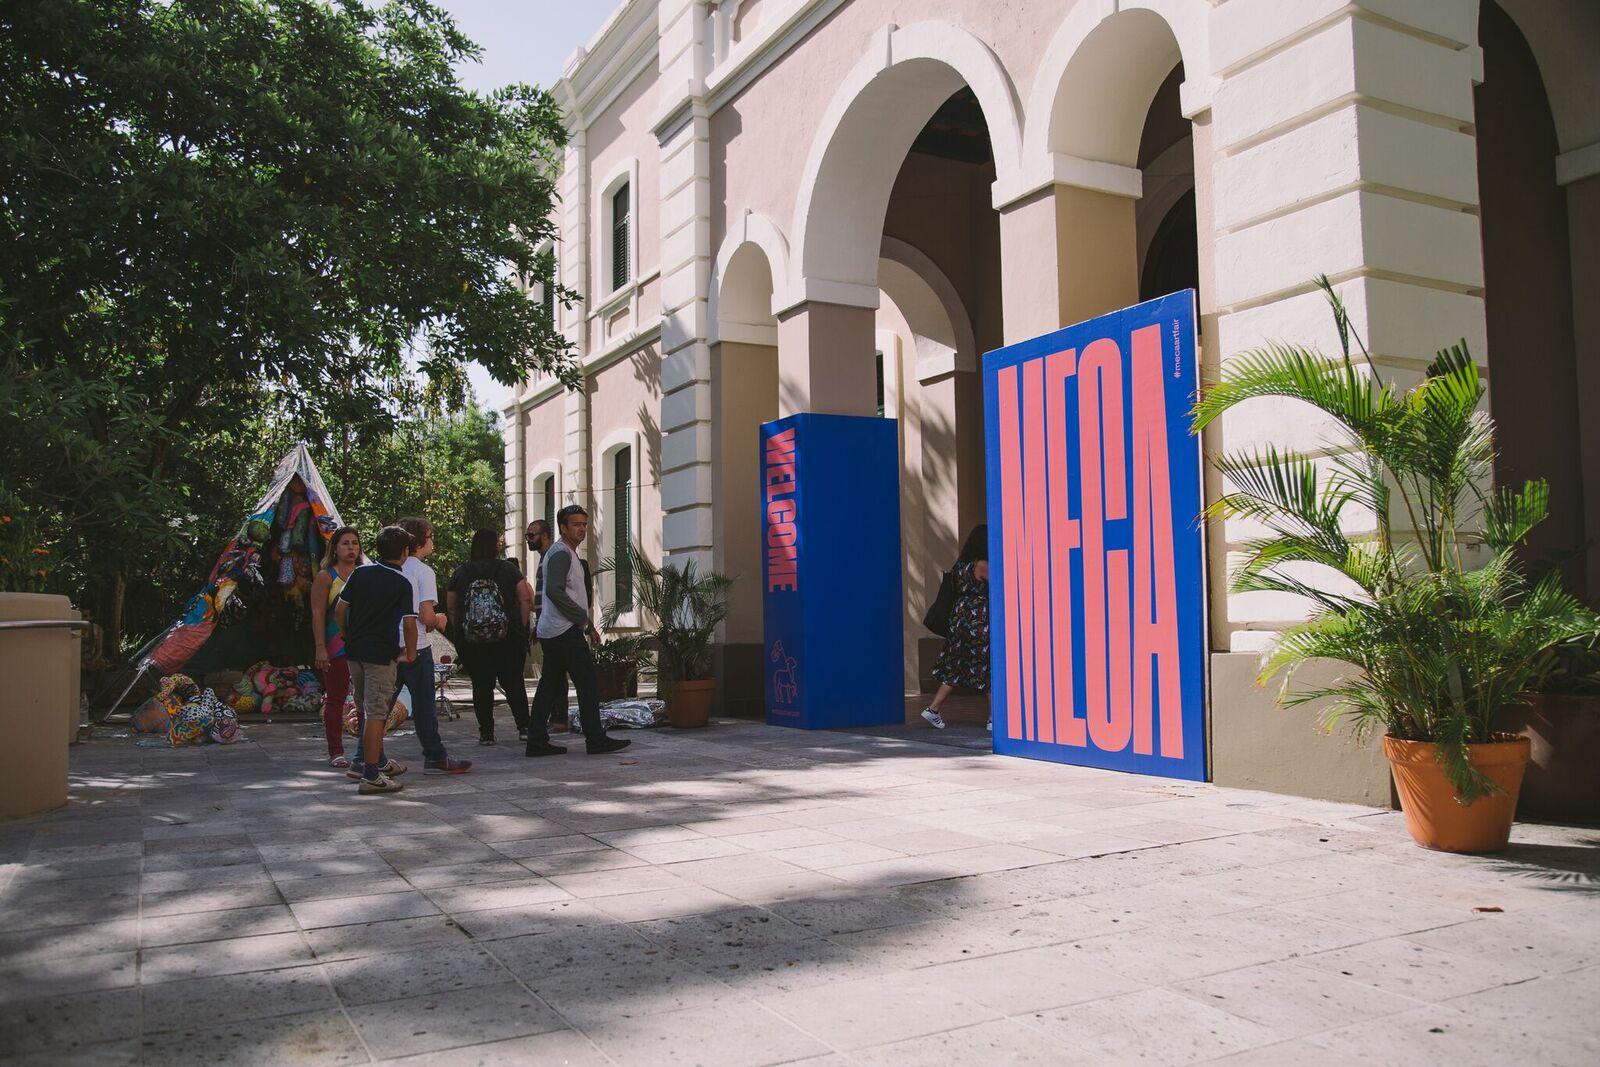 MECA (Mercado Caribeño or Caribbean Market)